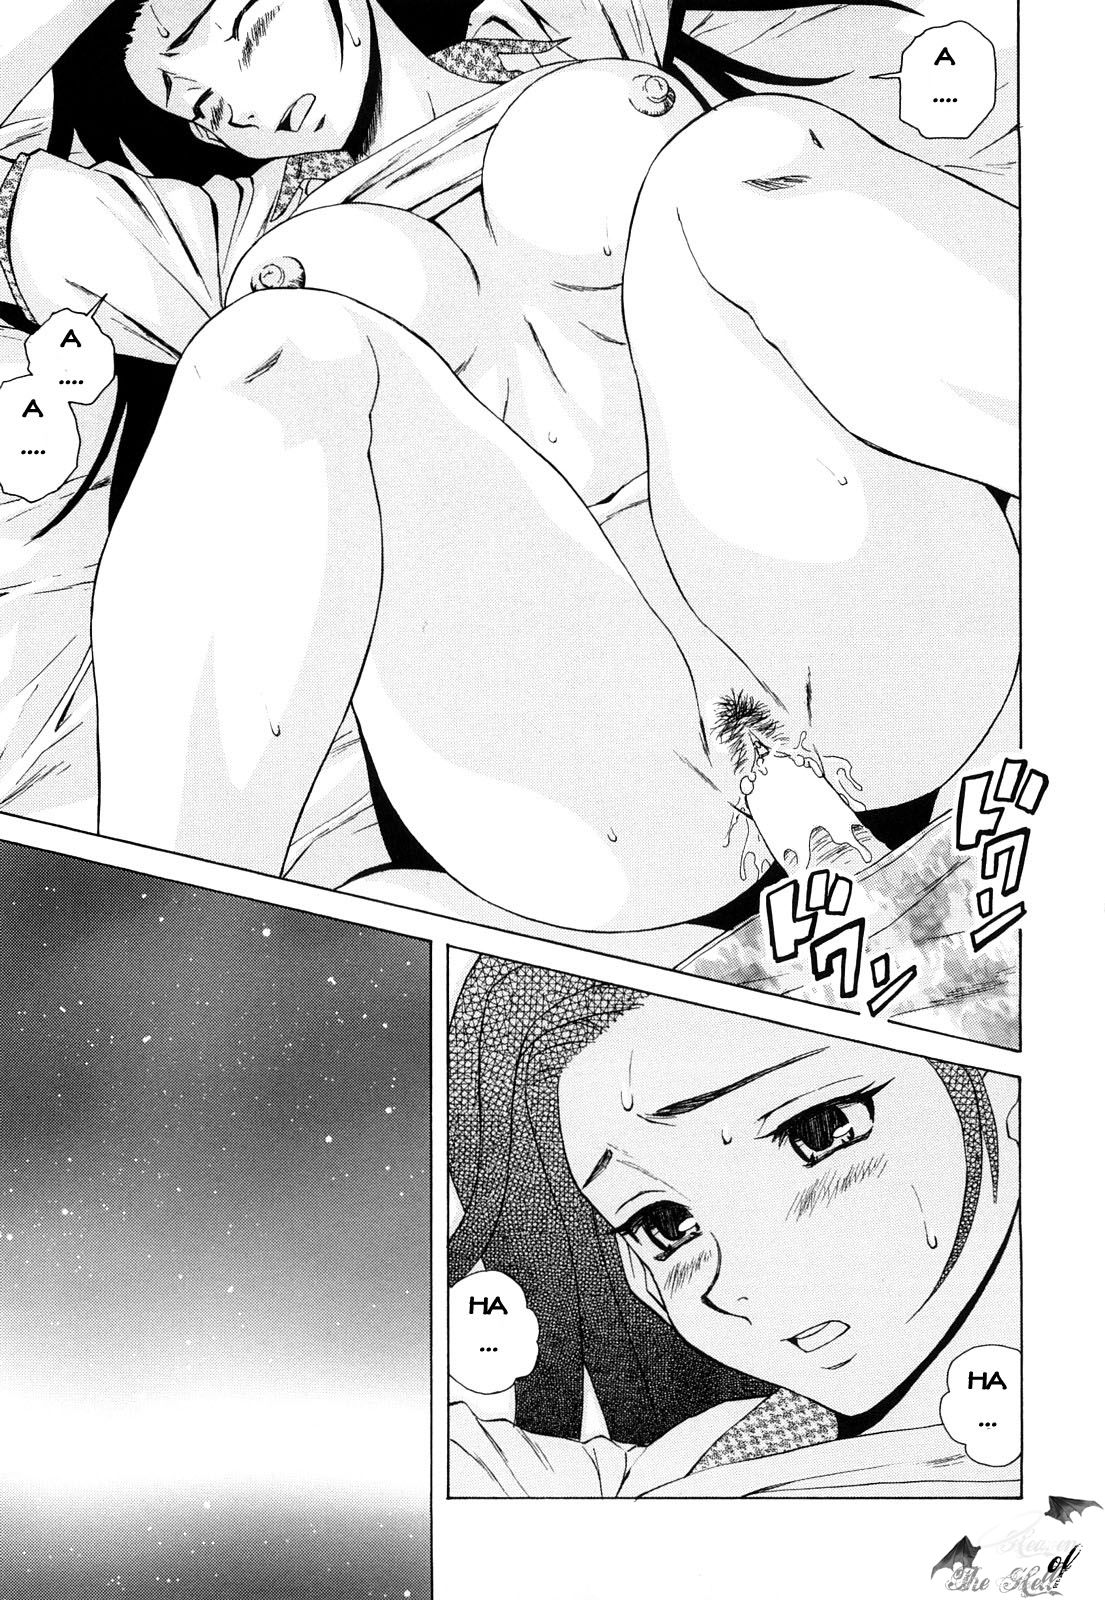 TruyenHay.Com - Ảnh 25 - Setsunai Omoi Chapter 4